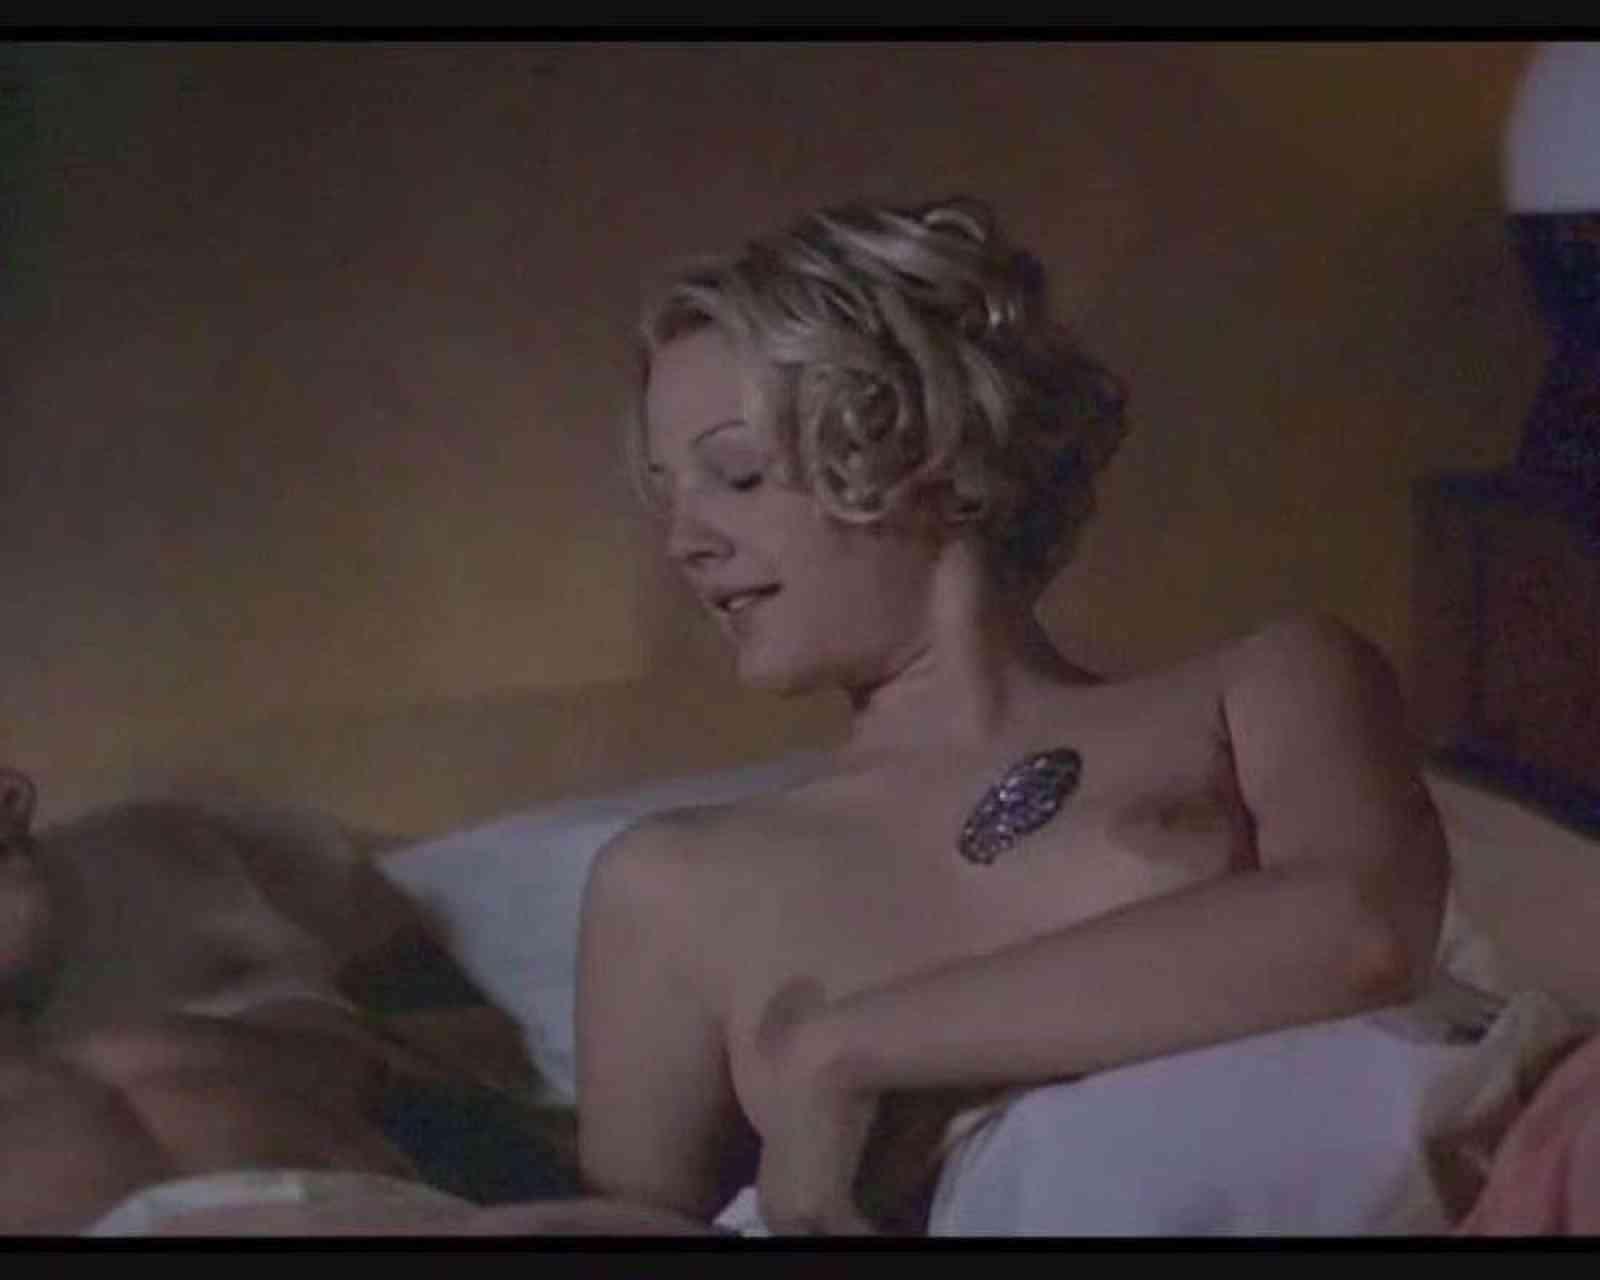 Drew Barrymore Porn Scene Drew Barrymore Nipples Free Pics Sex Images Porn